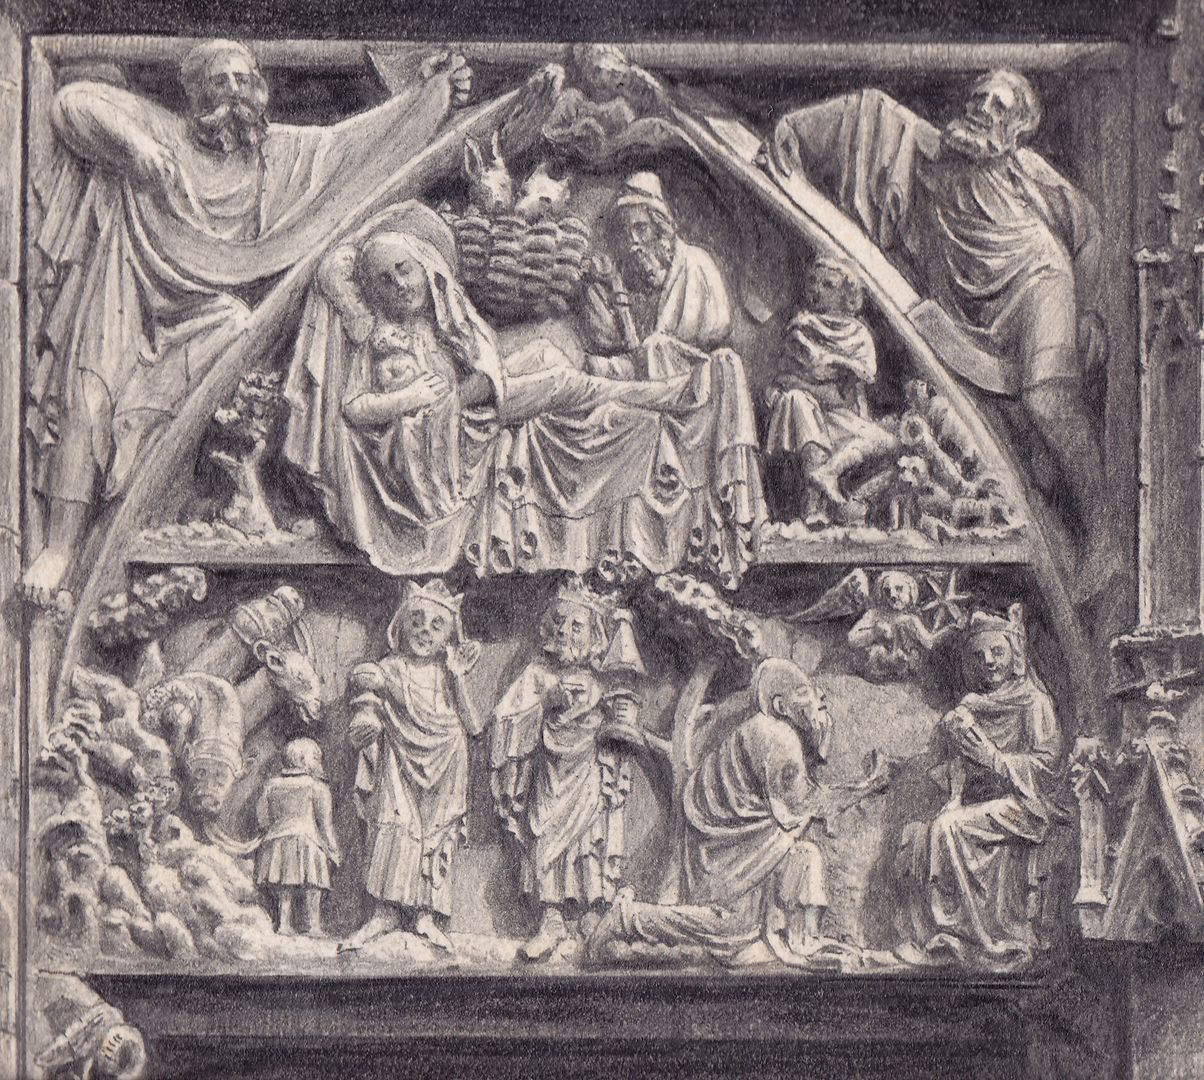 Tympanum register of the main portal of St. Lorenz Church Detail of the north half